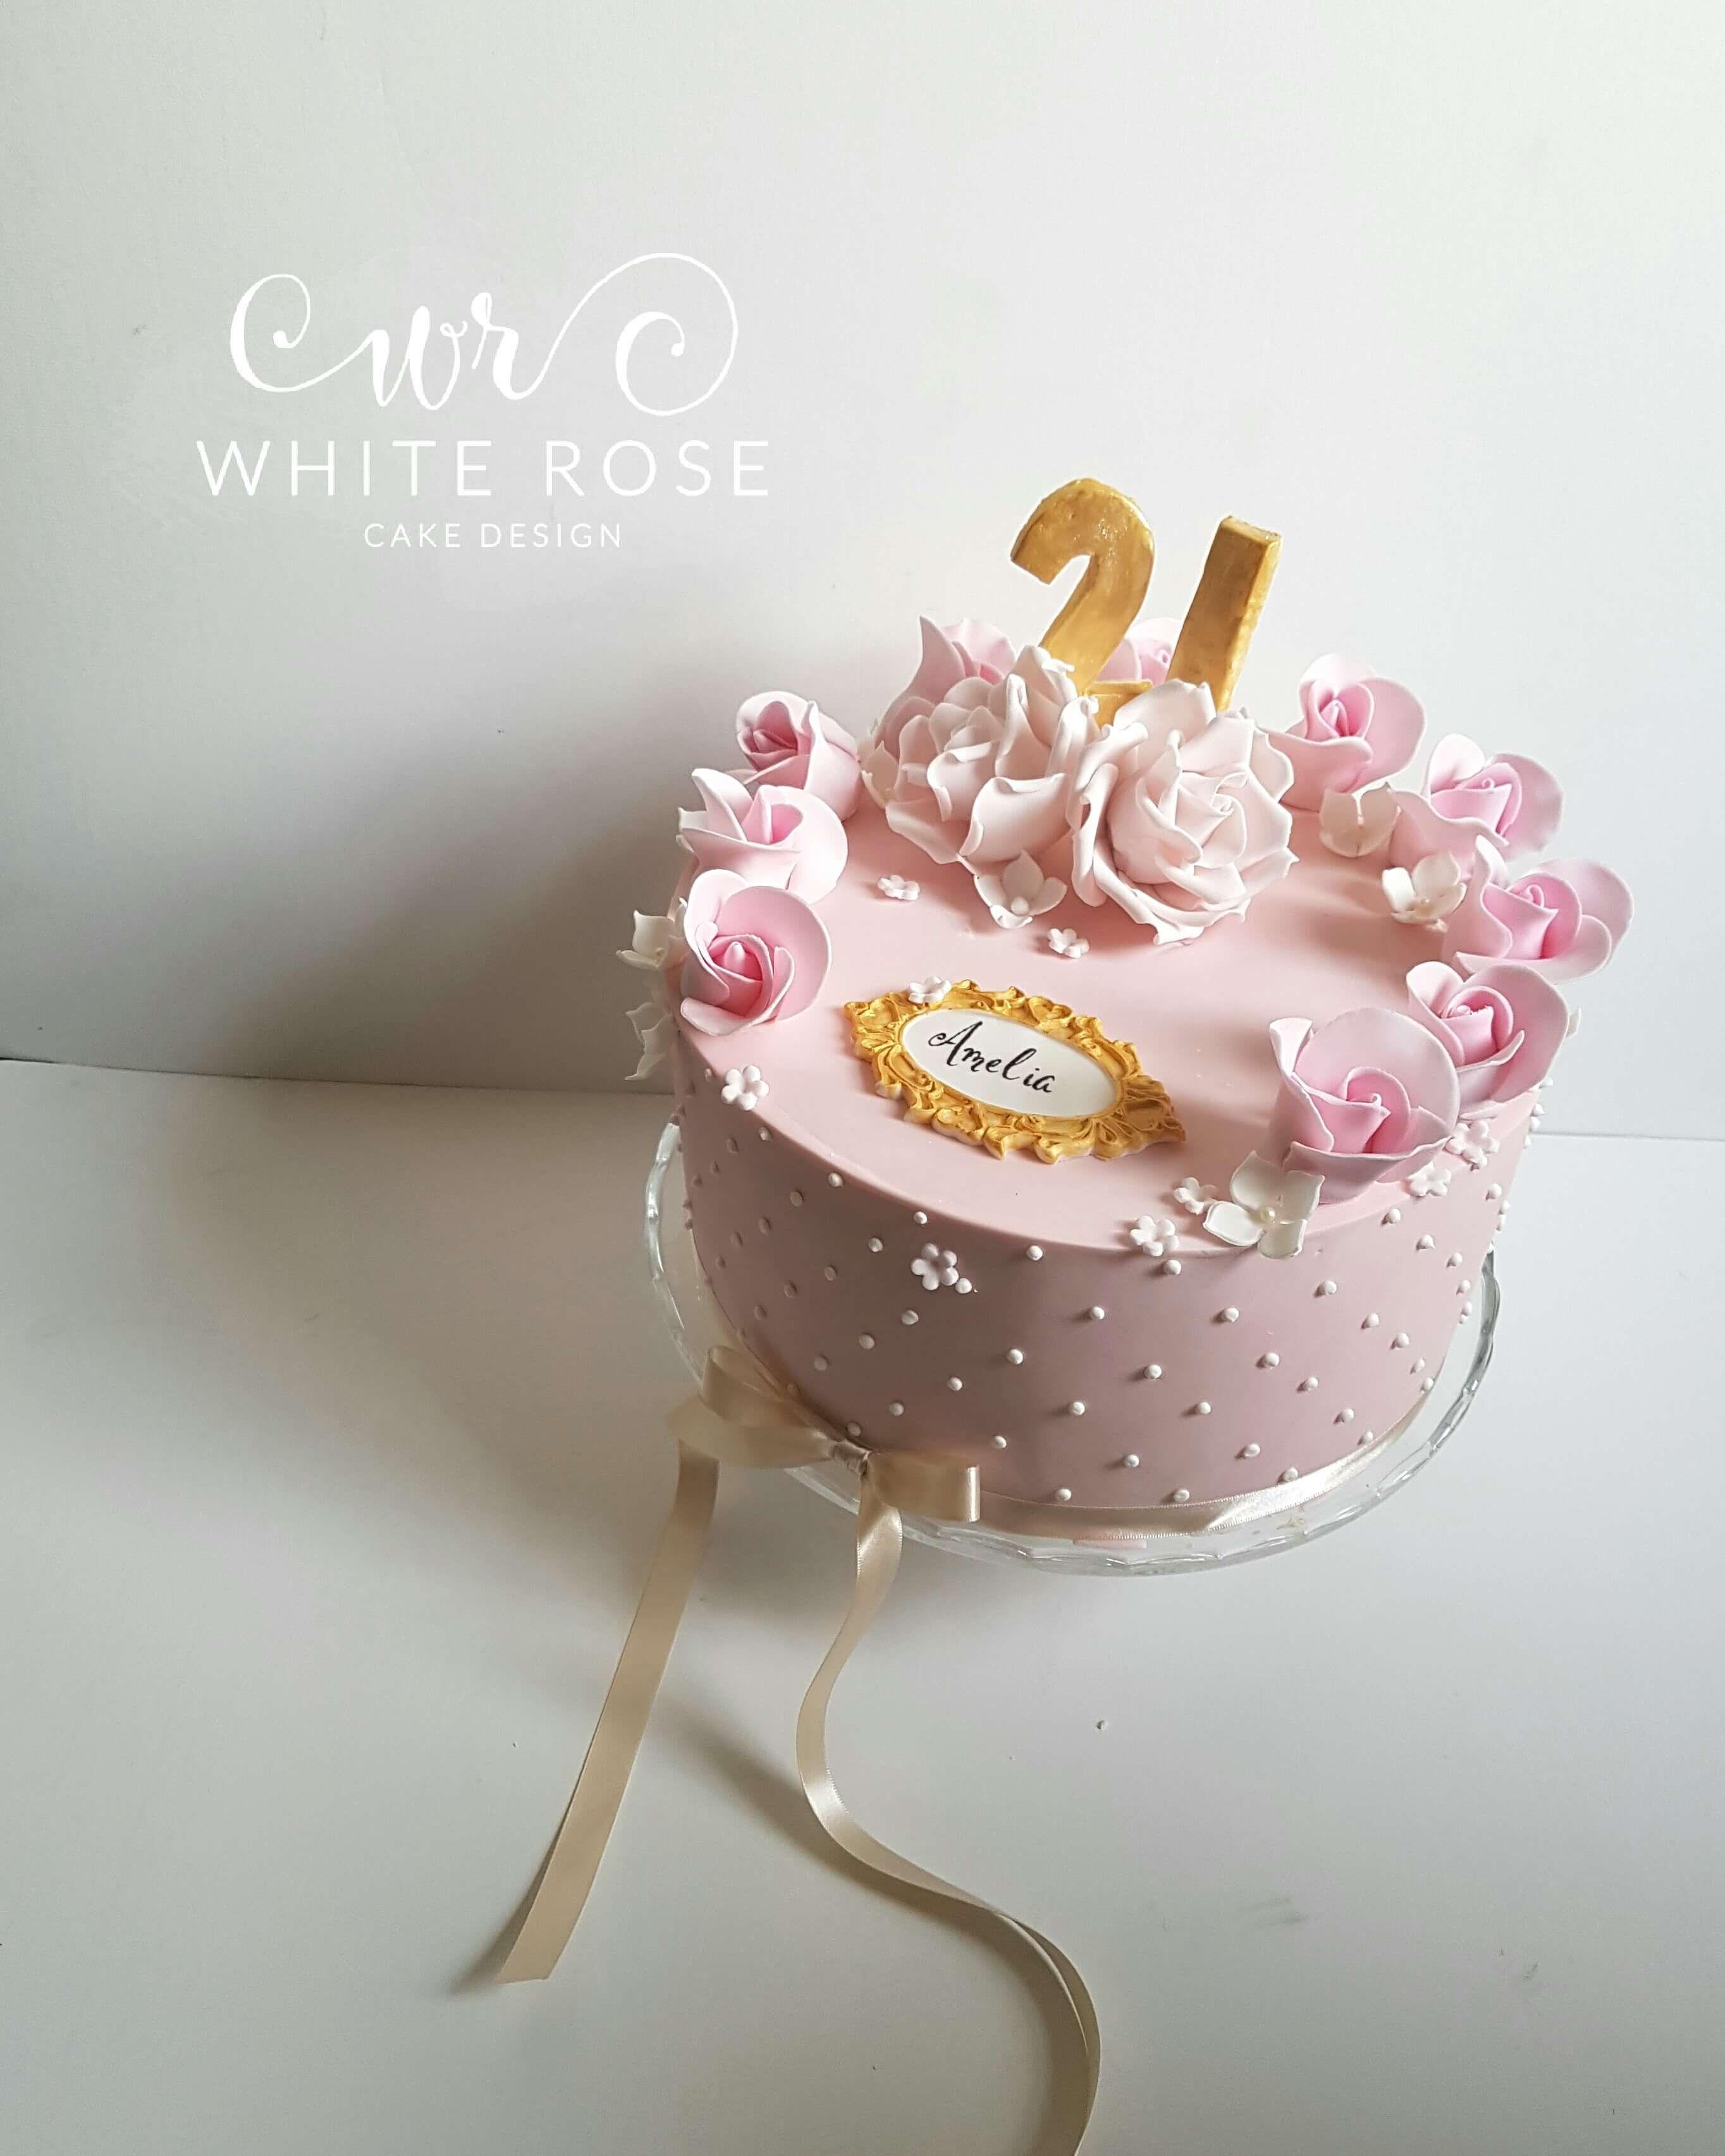 21st Birthday Cake With Roses By White Rose Cake Design Bespoke Cake